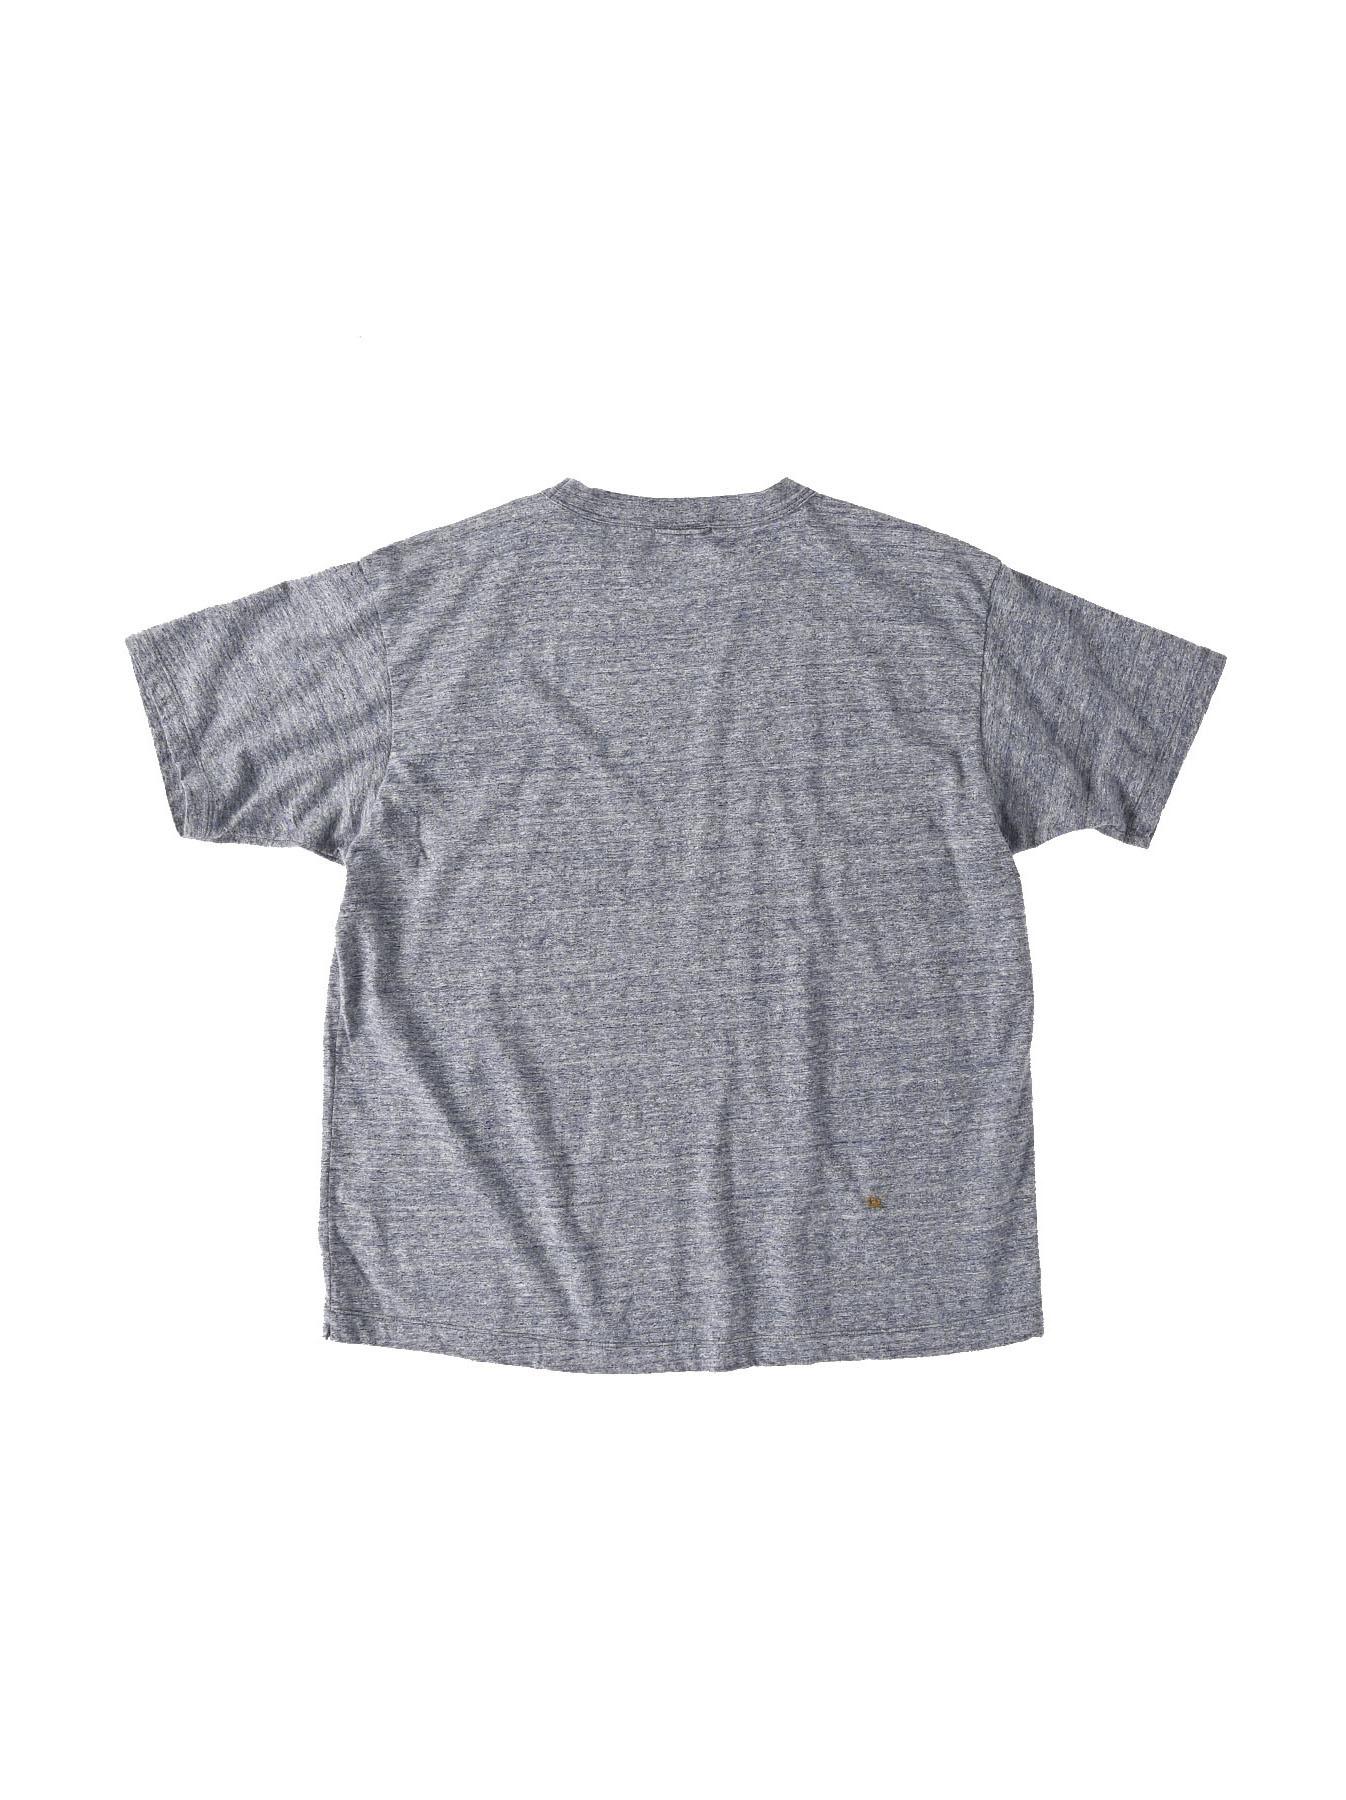 Top Sumite de Owl T-shirt-9